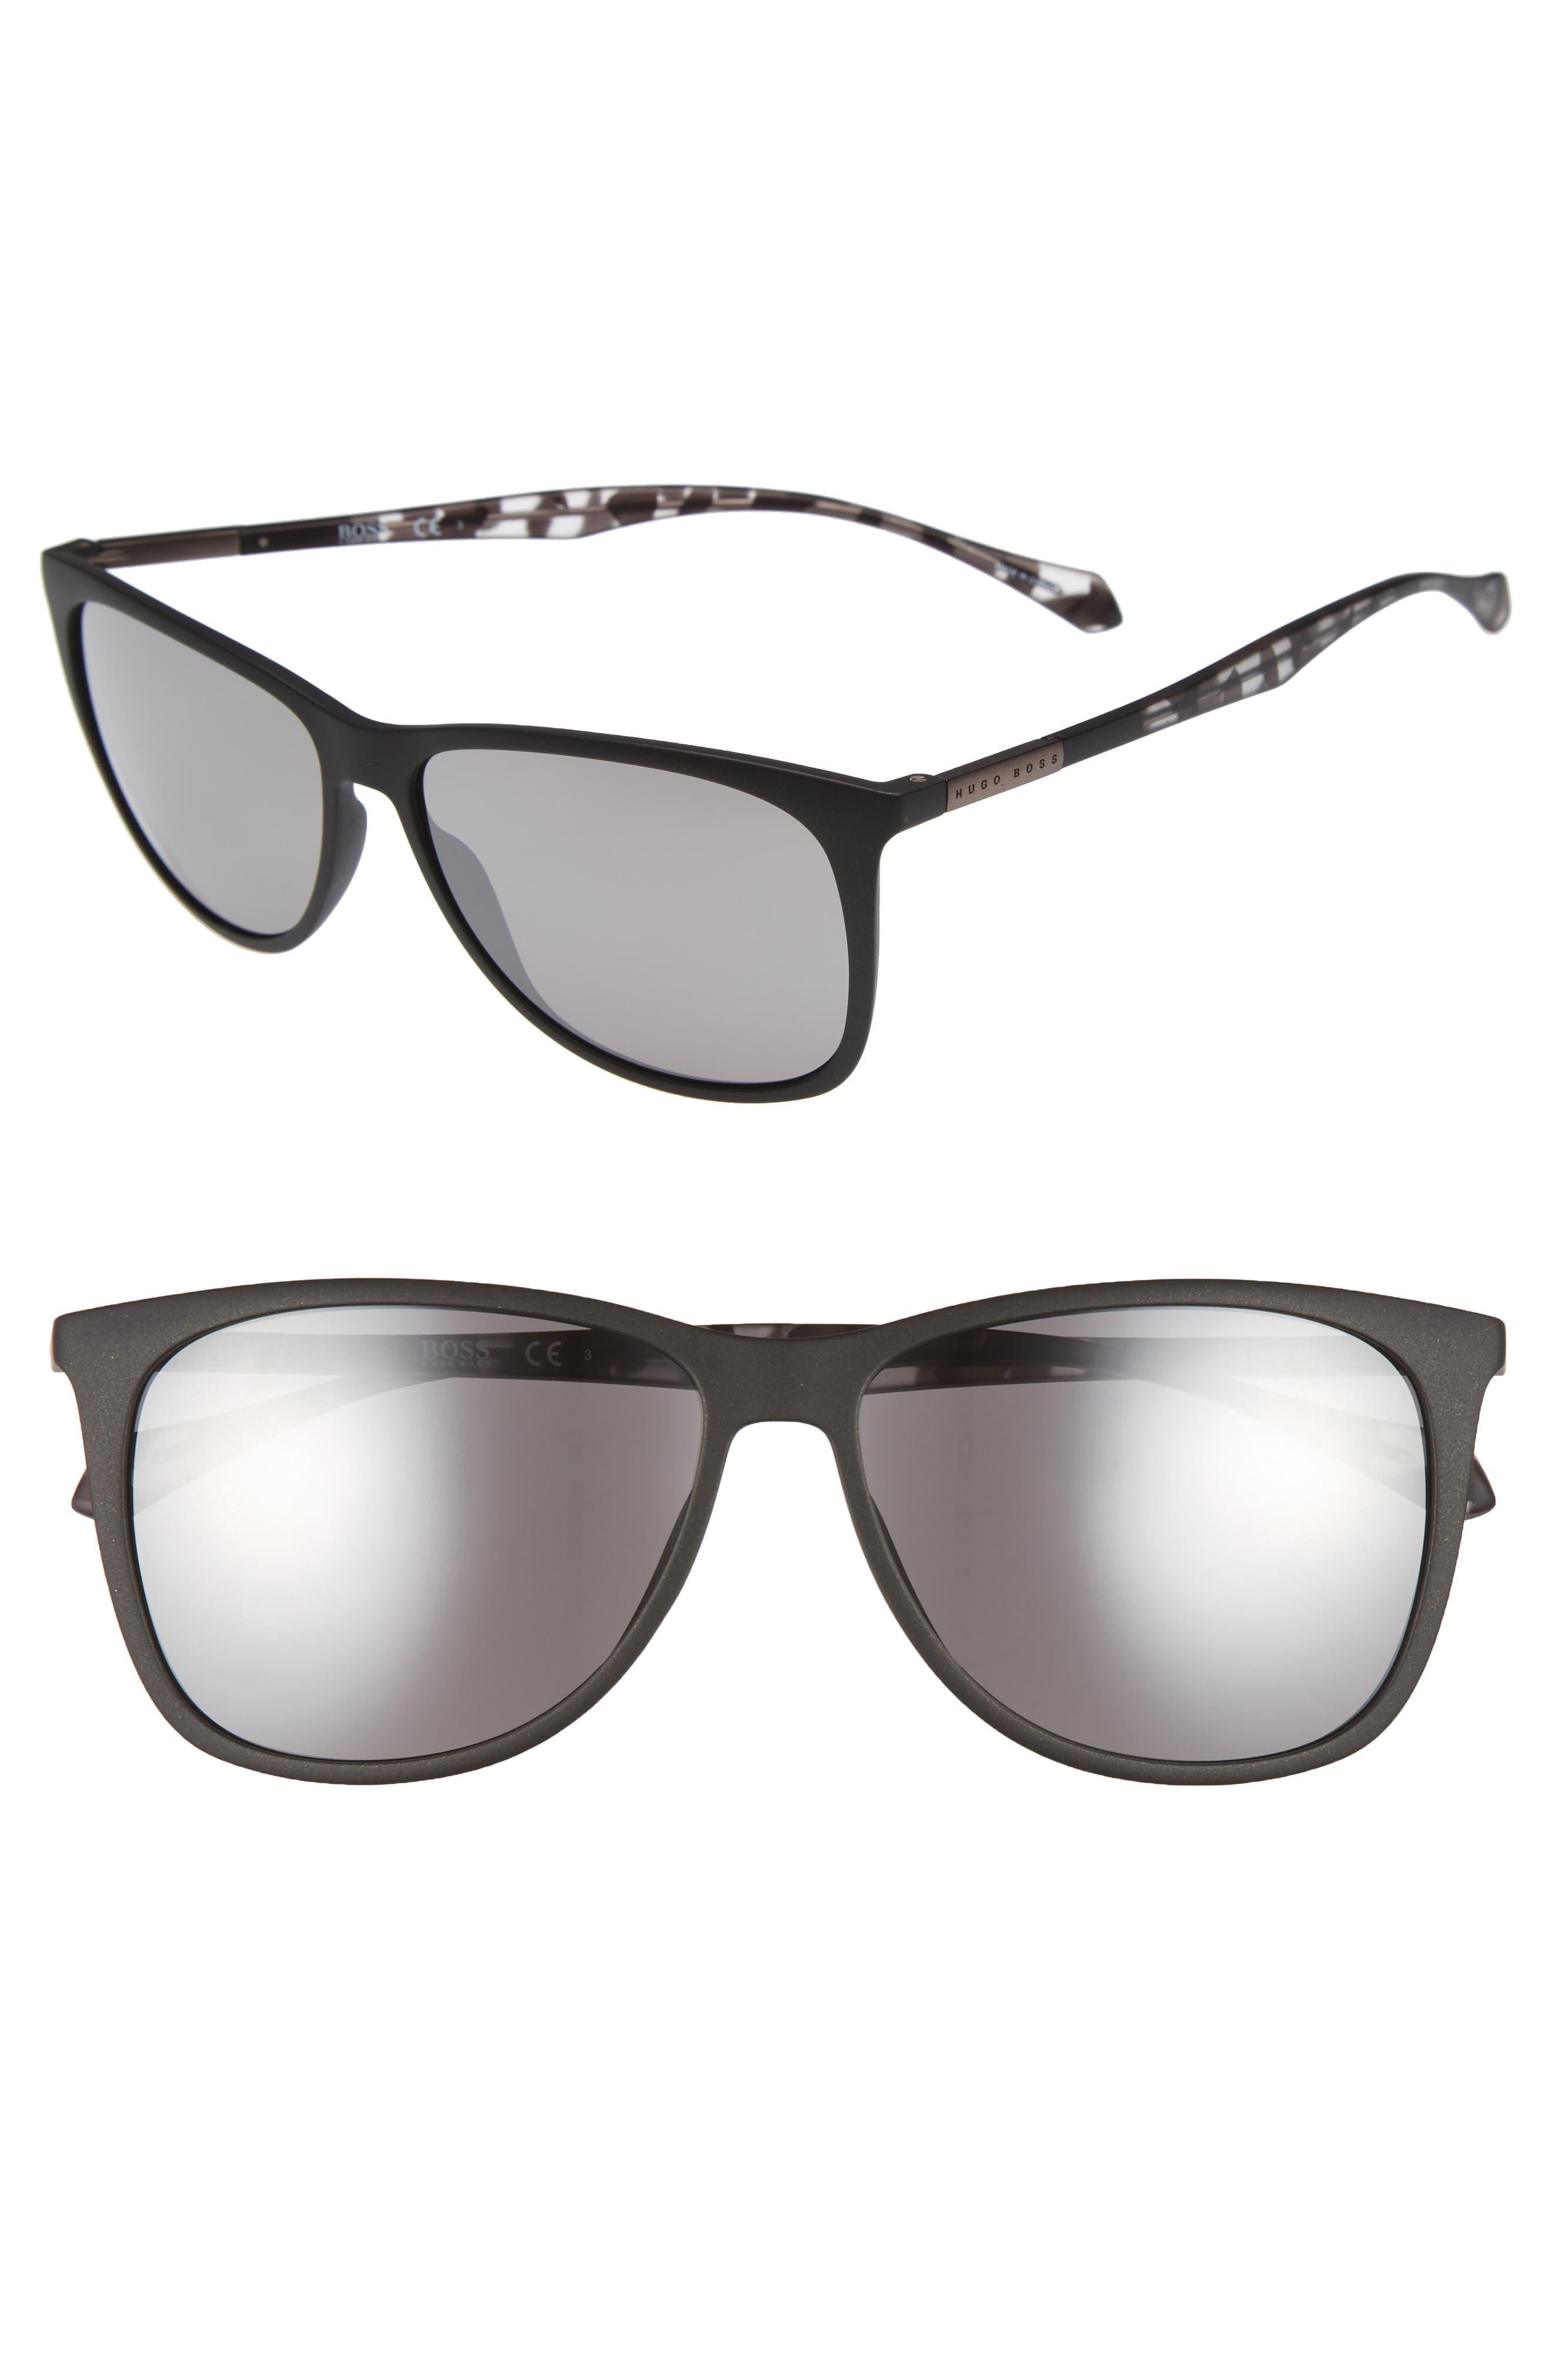 58mm Sunglasses,                         Main,                         color, 002